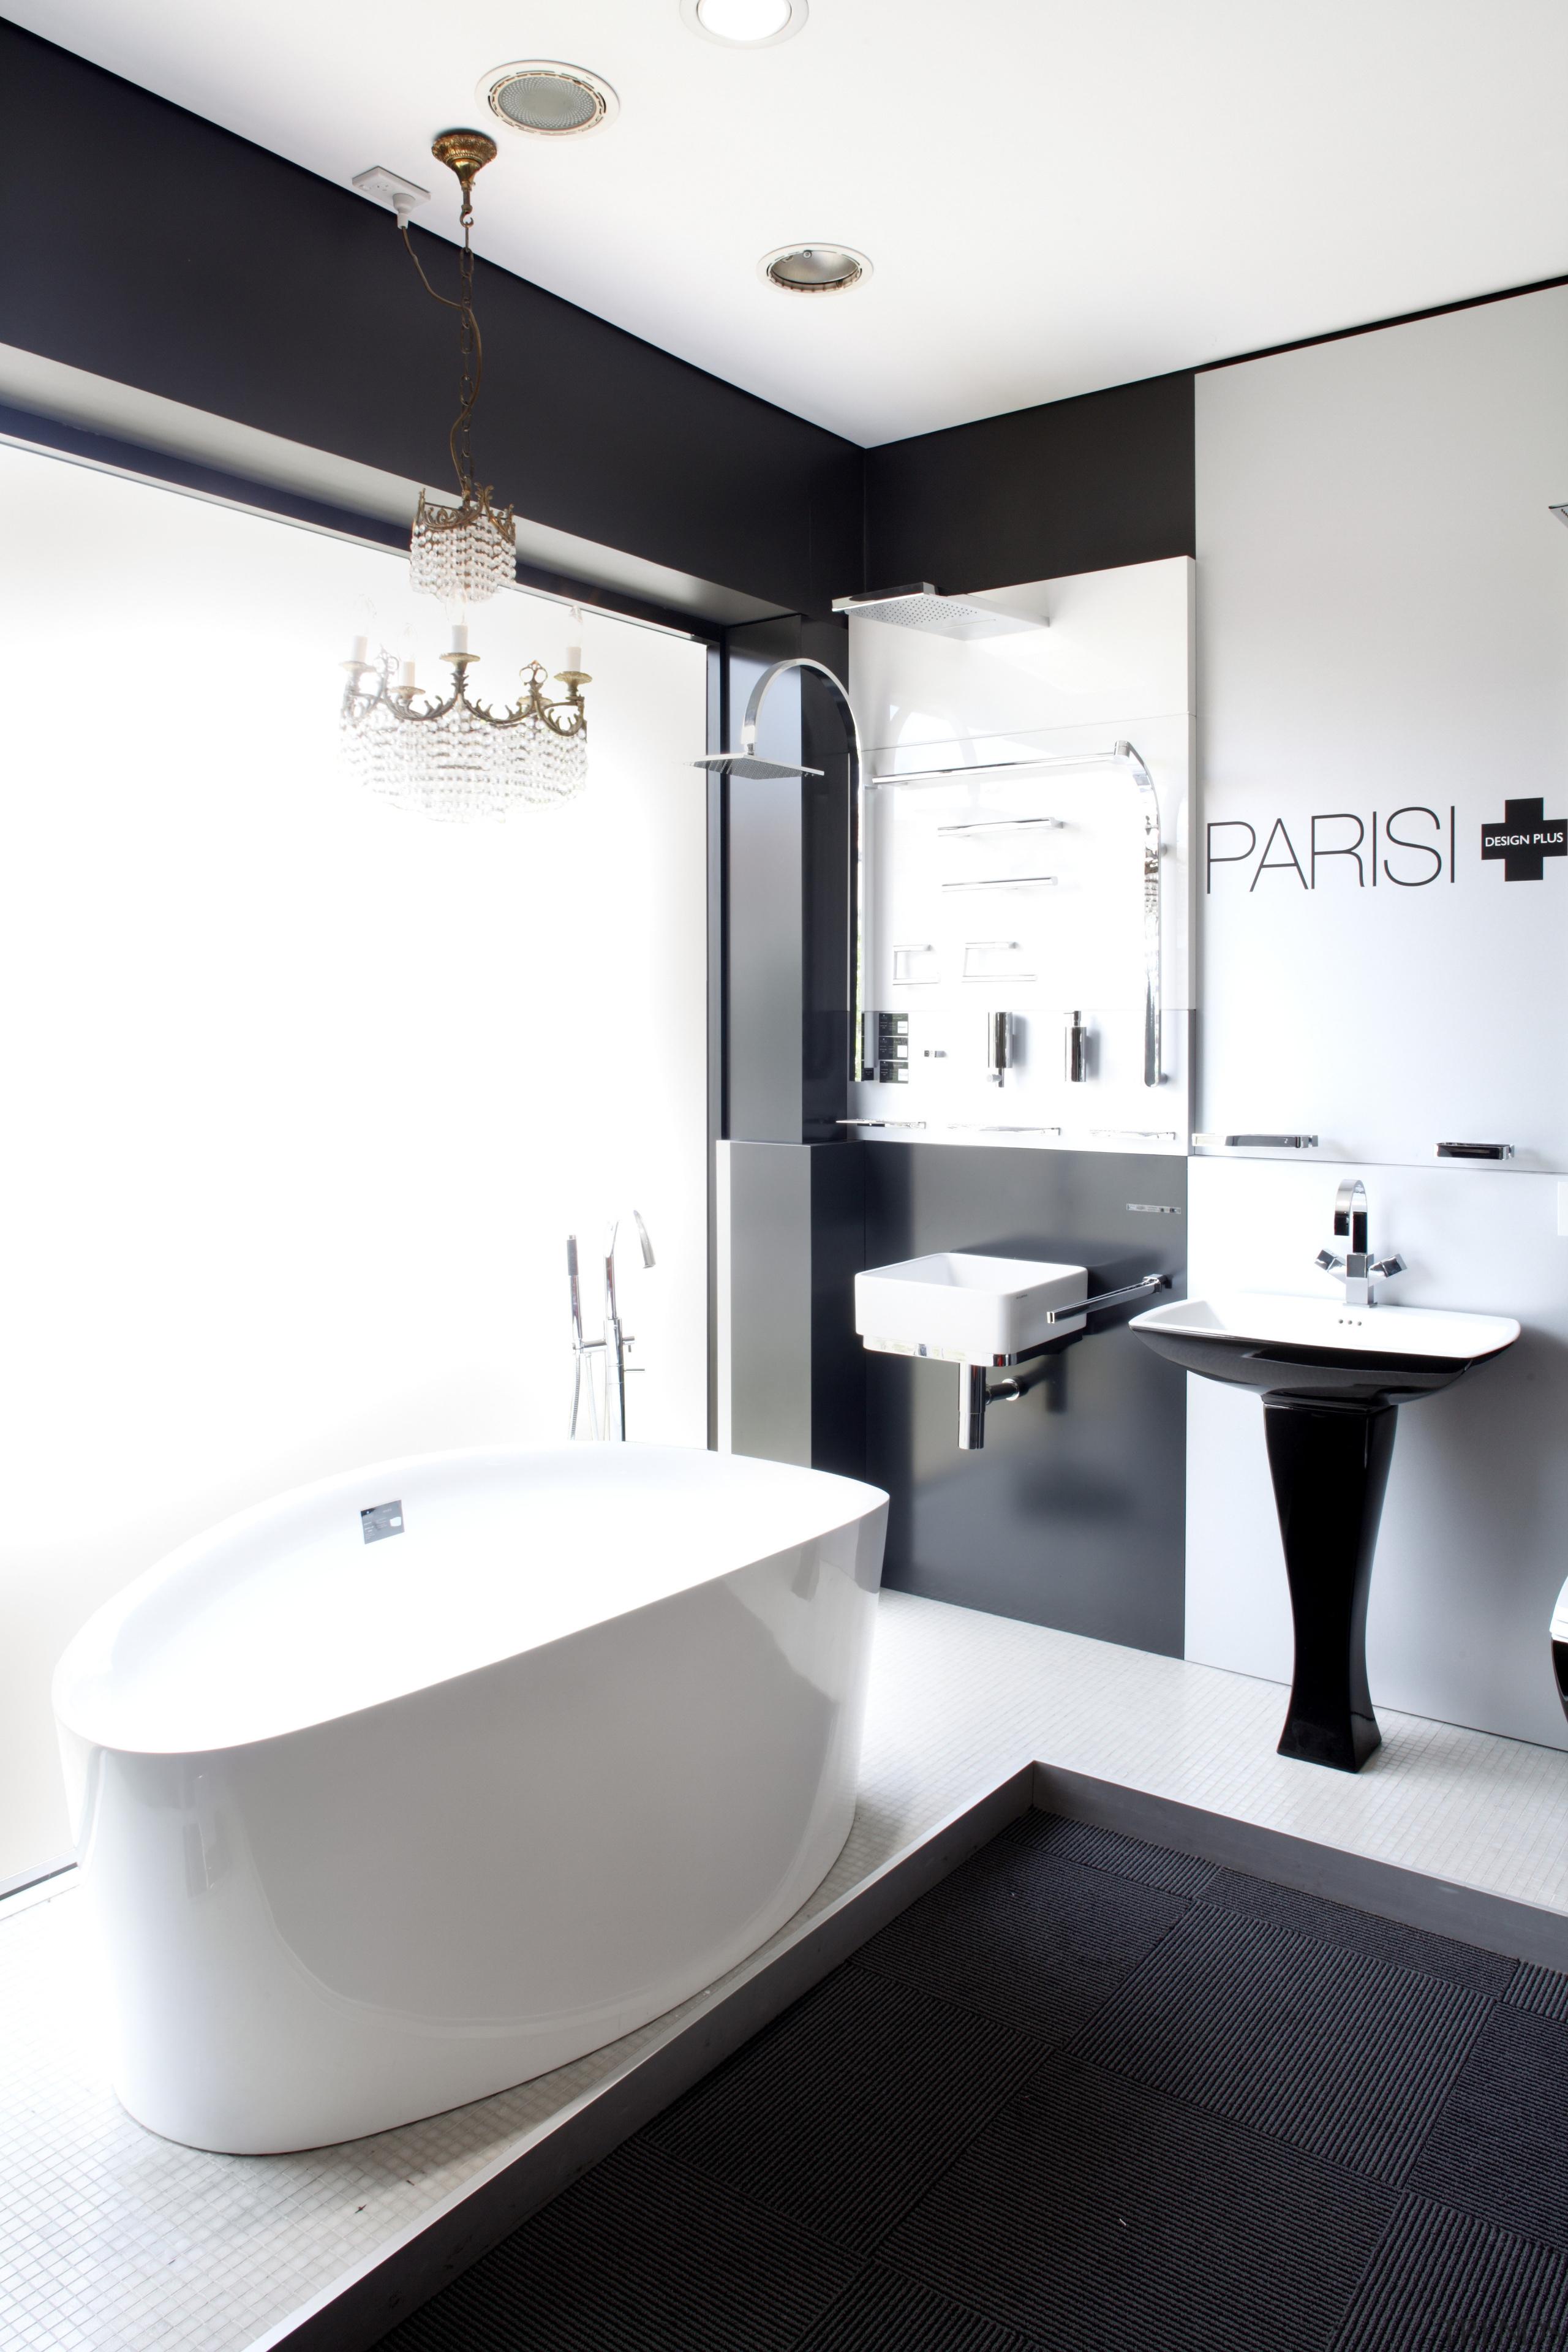 Australian and international bathroom brands at Cass Brothers bathroom, bathroom accessory, bathroom cabinet, bathroom sink, floor, interior design, plumbing fixture, product design, room, sink, tap, white